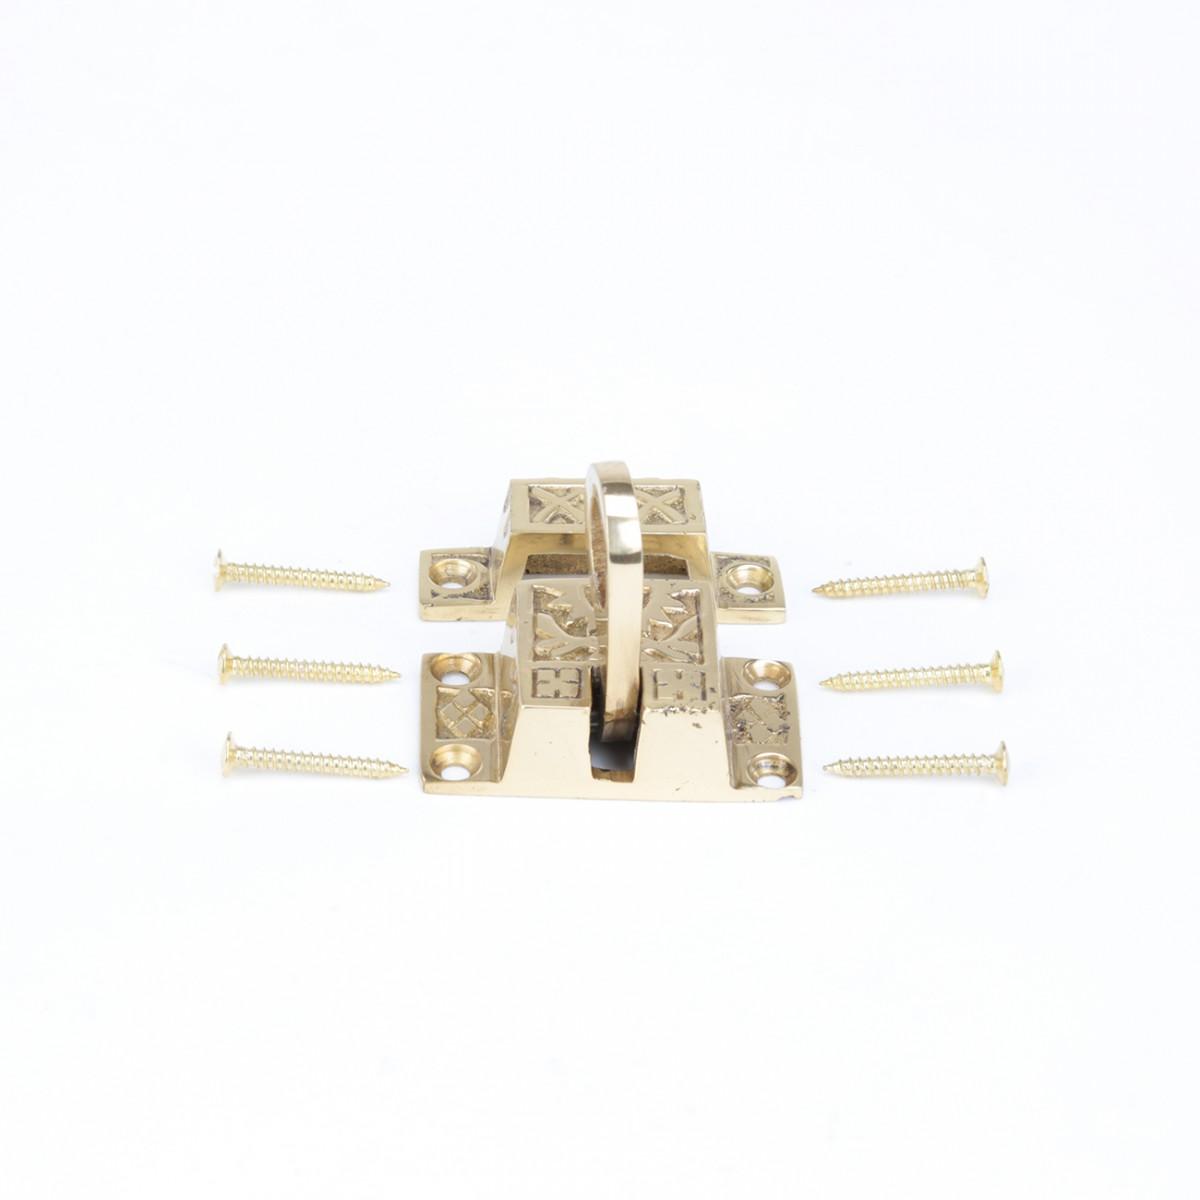 Ornate Cabinet Or Cupboard Slide Latch Solid Brass 2 W Brass Furniture Cabinet Cupboard Hardware Slide Lock Latch Catch Holder